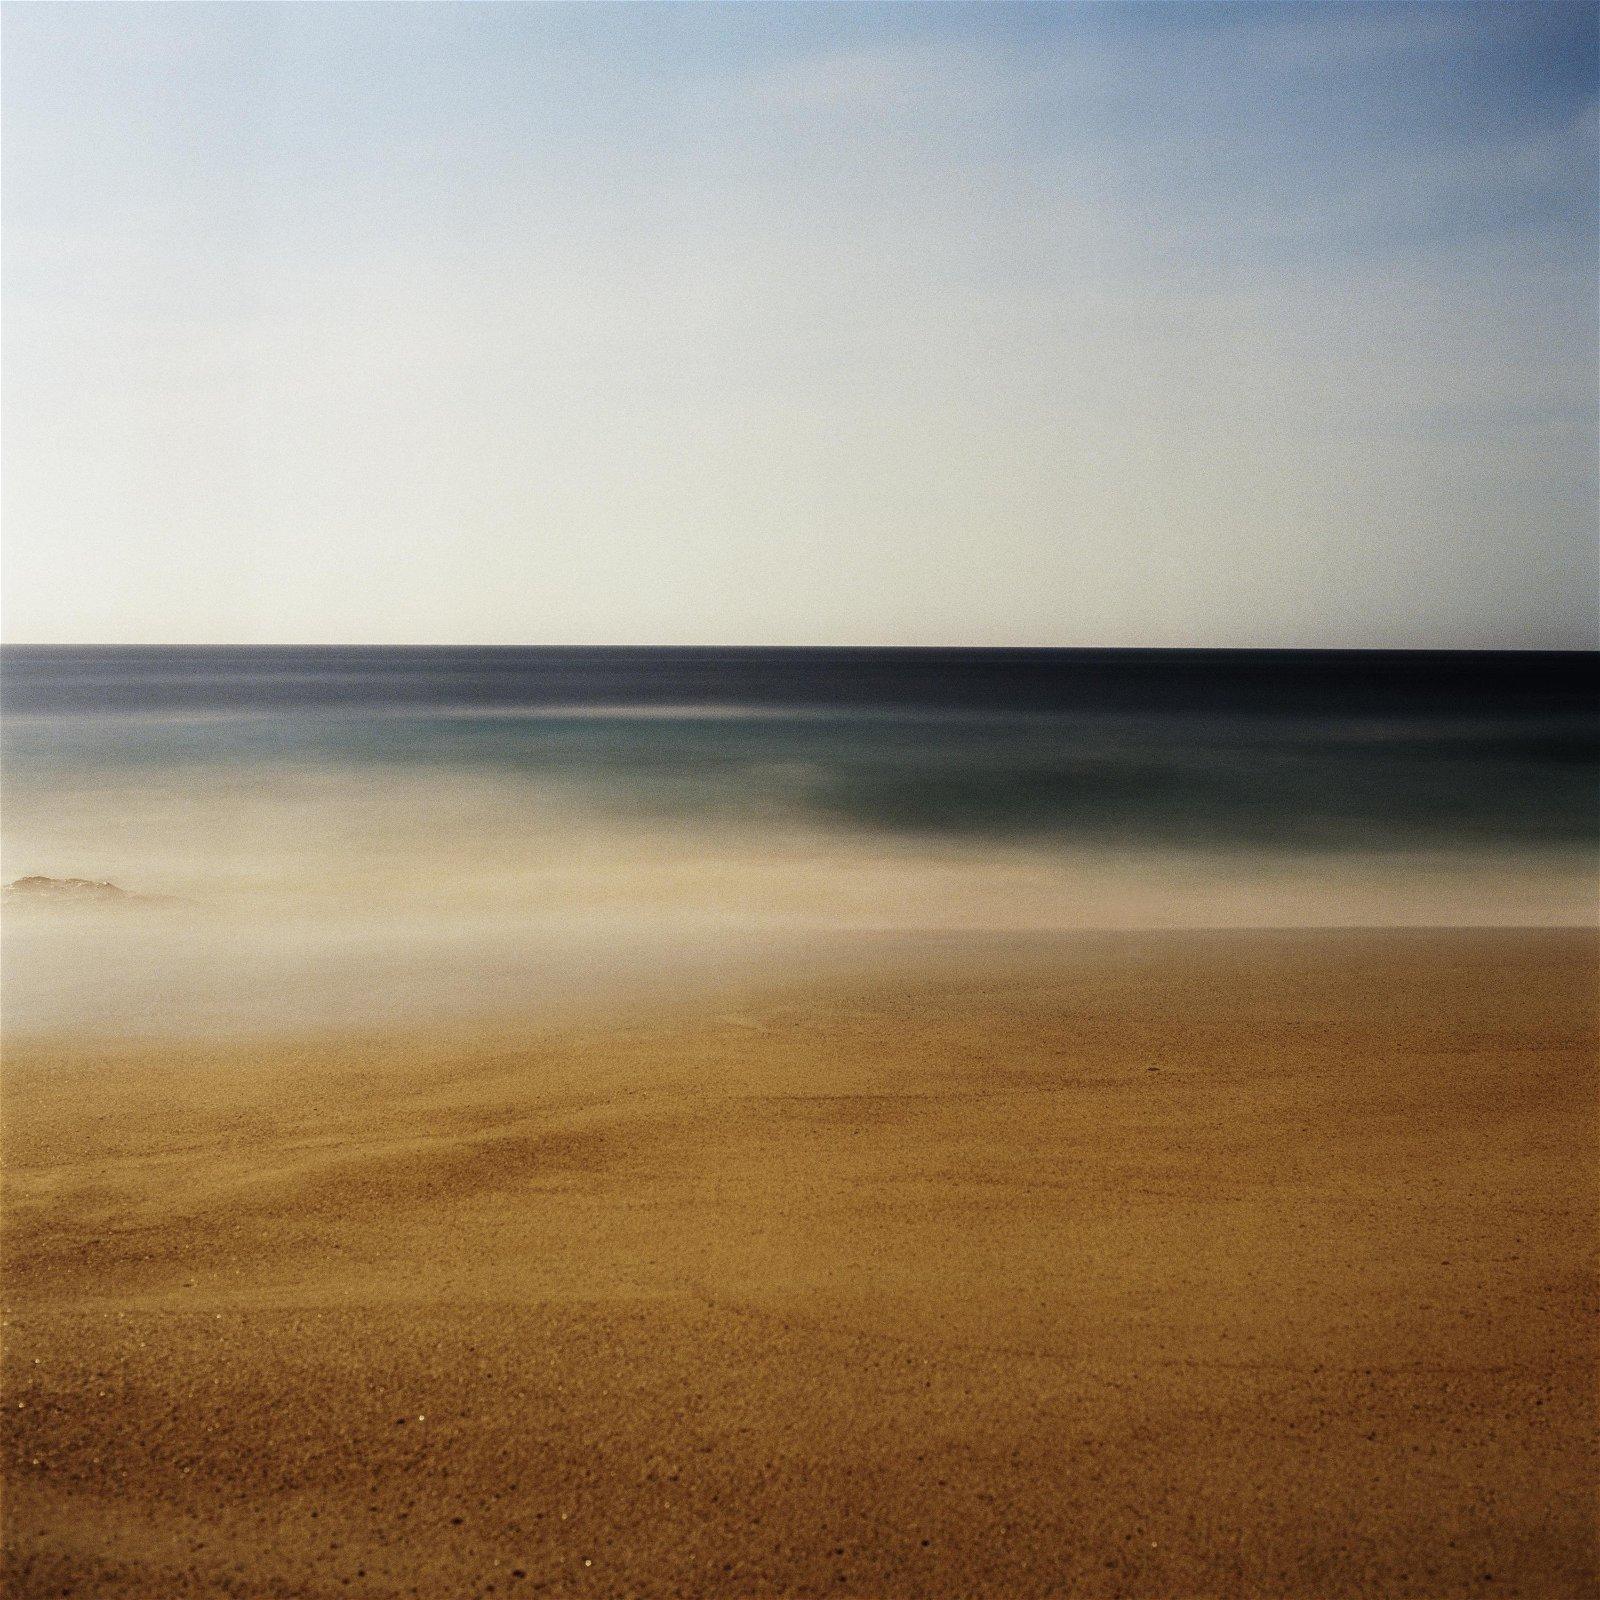 Daniel Fuller - 1:12 a.m. Playa Las Viudas